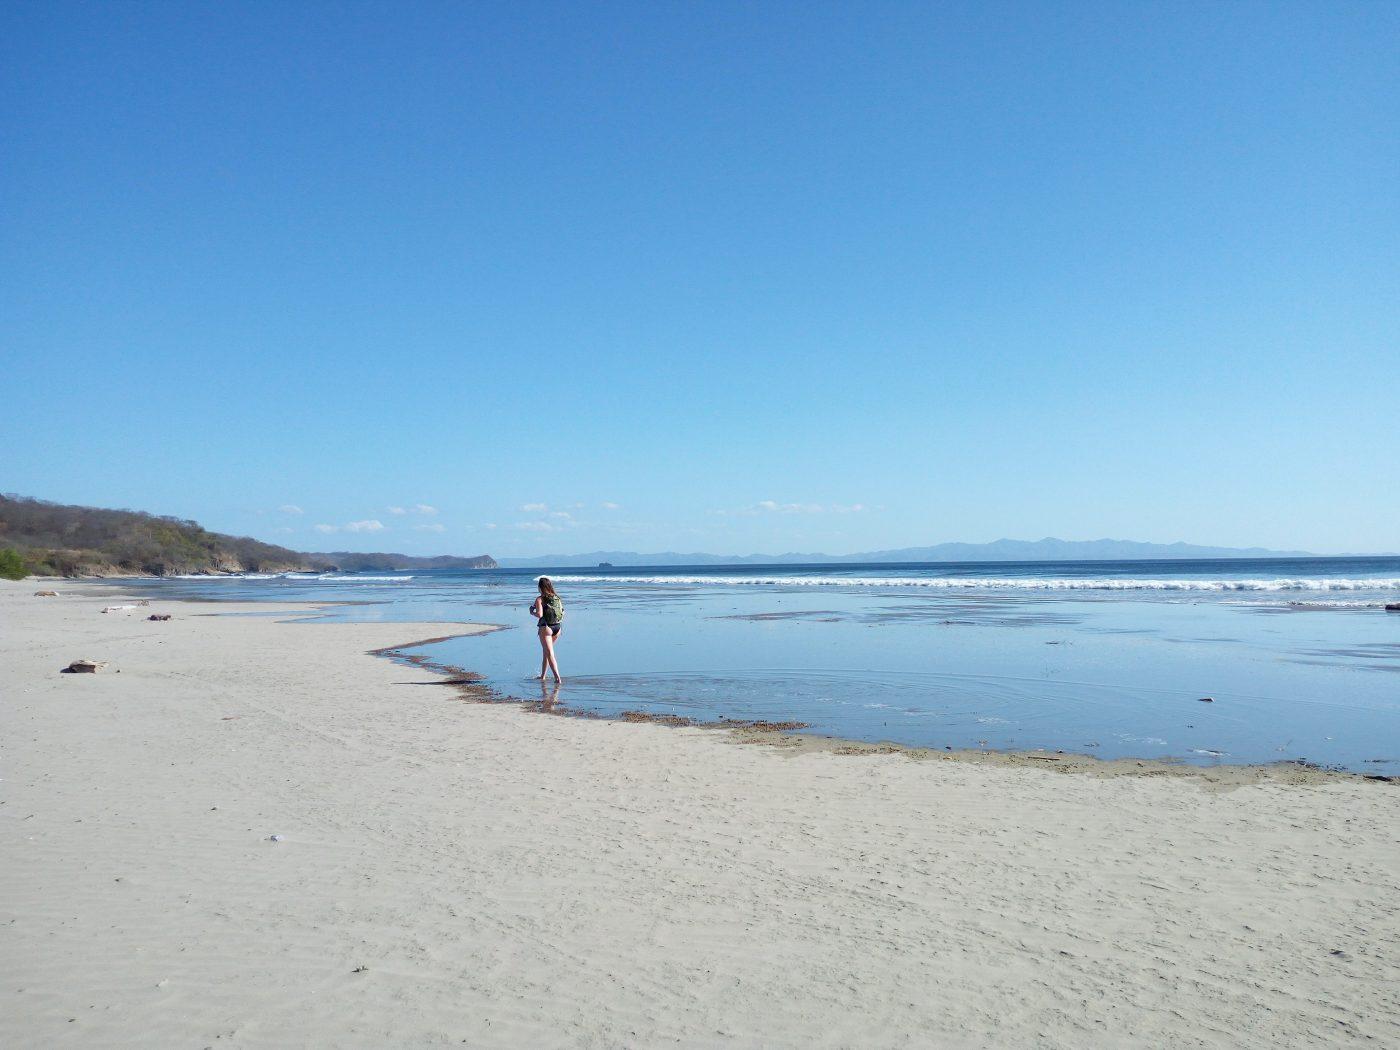 Yankee beach San juan del sur, beaches of nicaragua. What to see in Nicaragua